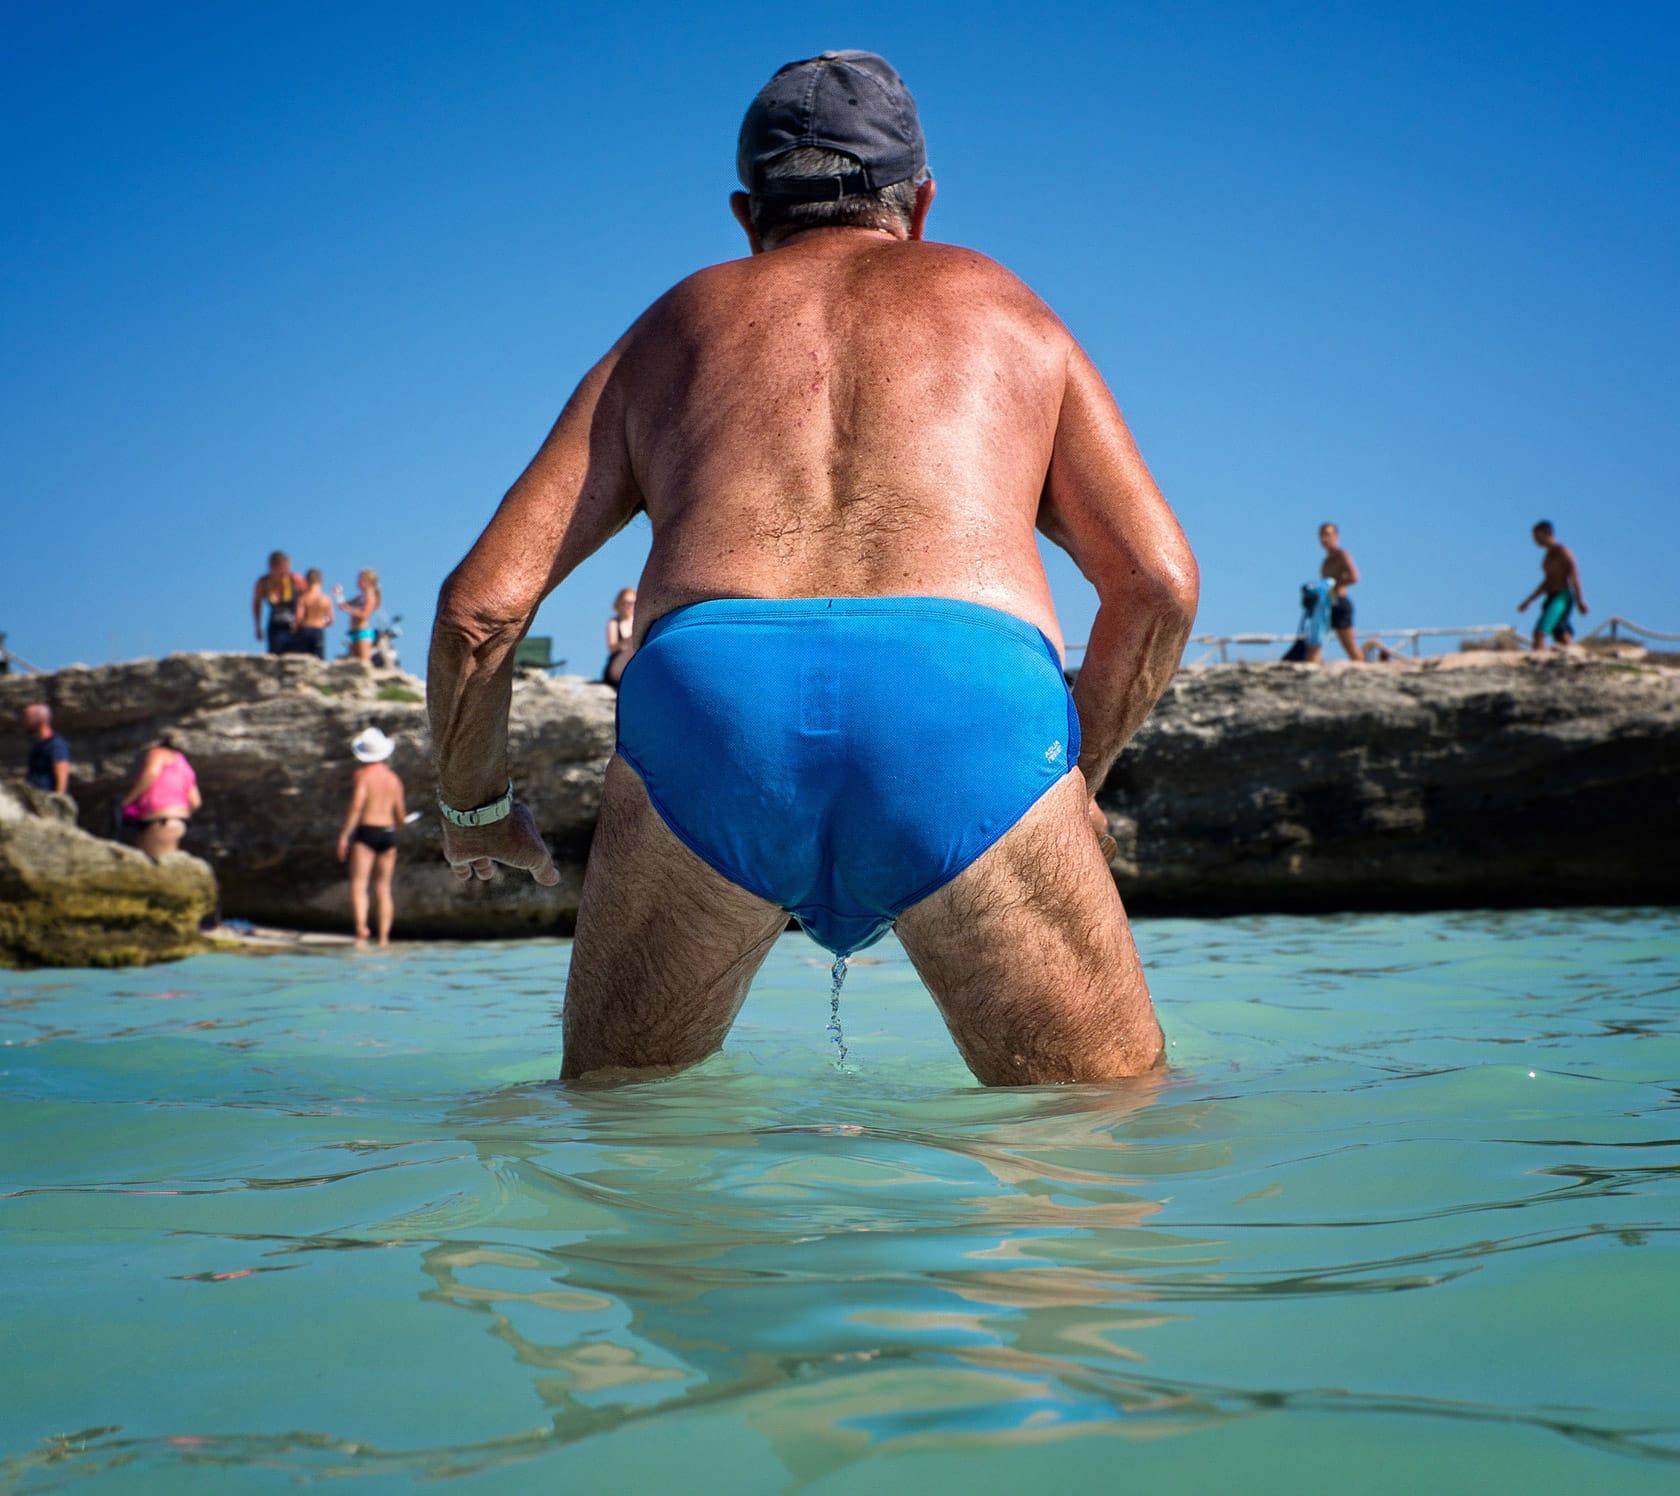 Lorenzo Grifantini Beach Street Photography 1